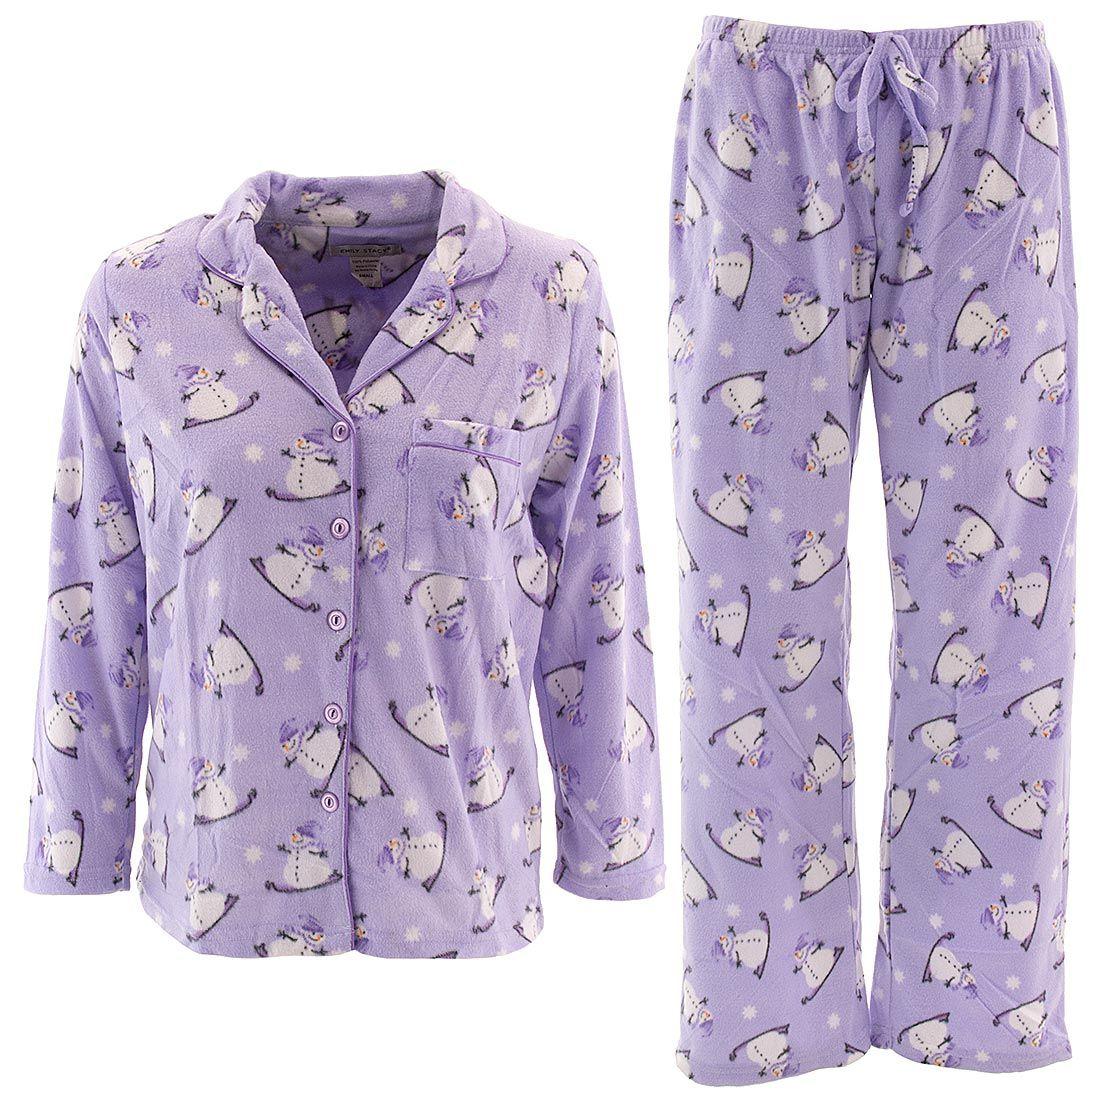 b0c674b4604d Purple Snowman Fleece Pajamas for Women - Click to enlarge